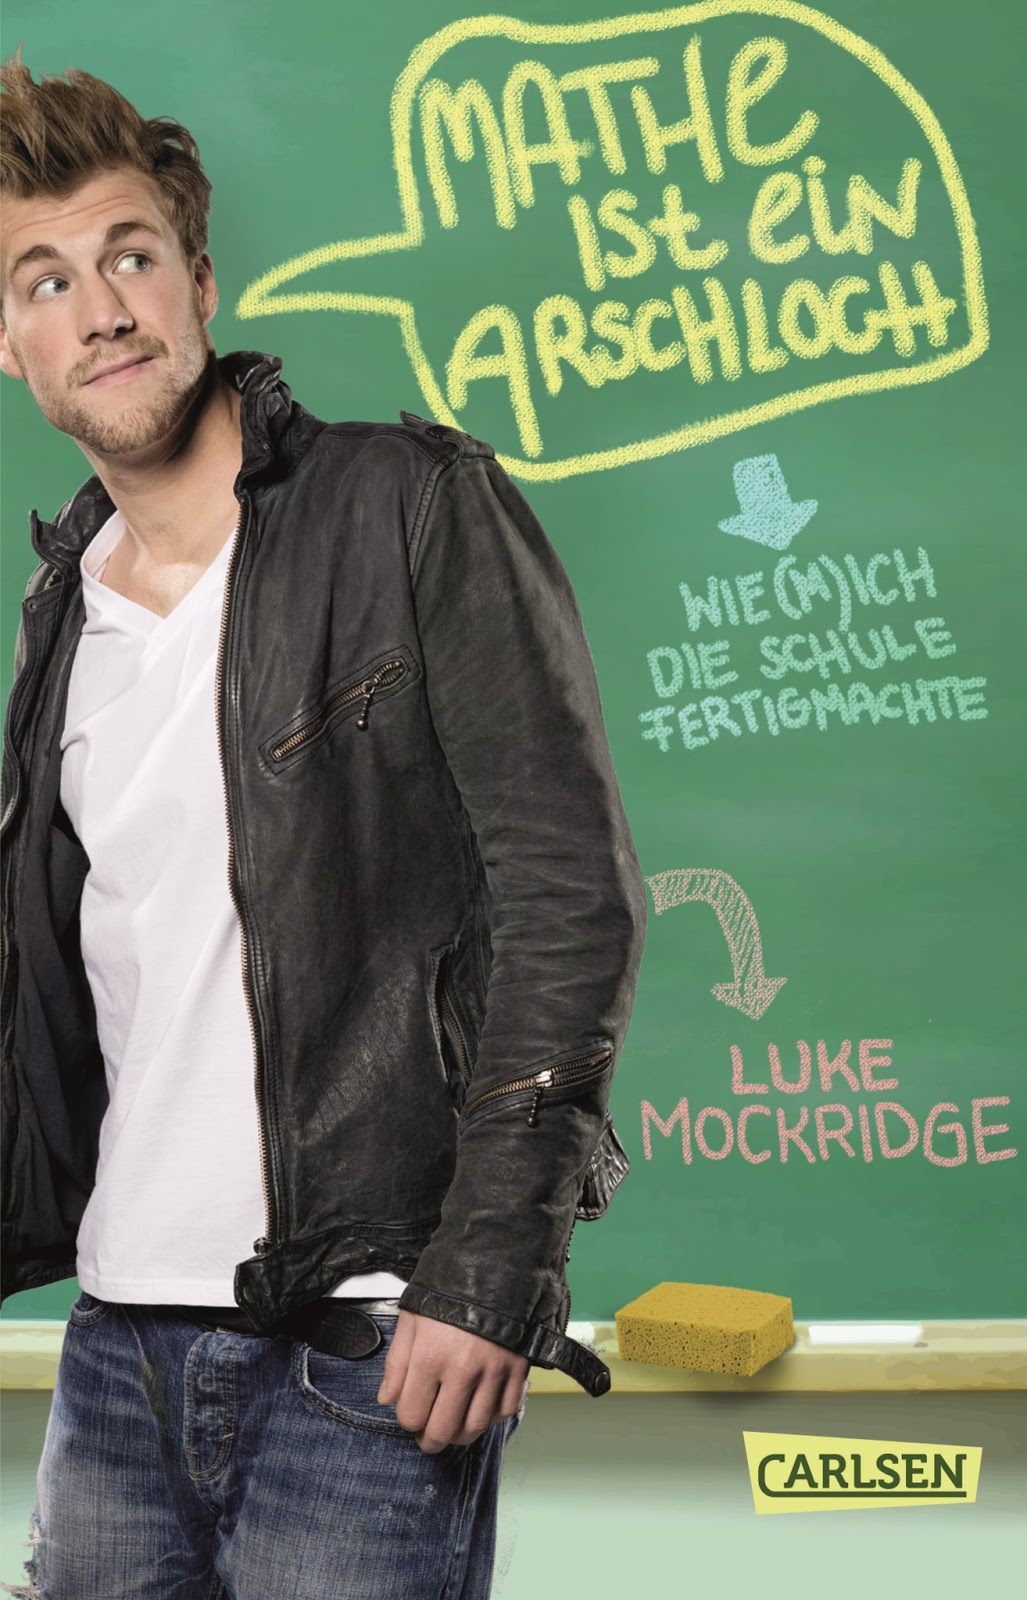 Luke Mockridge Schule